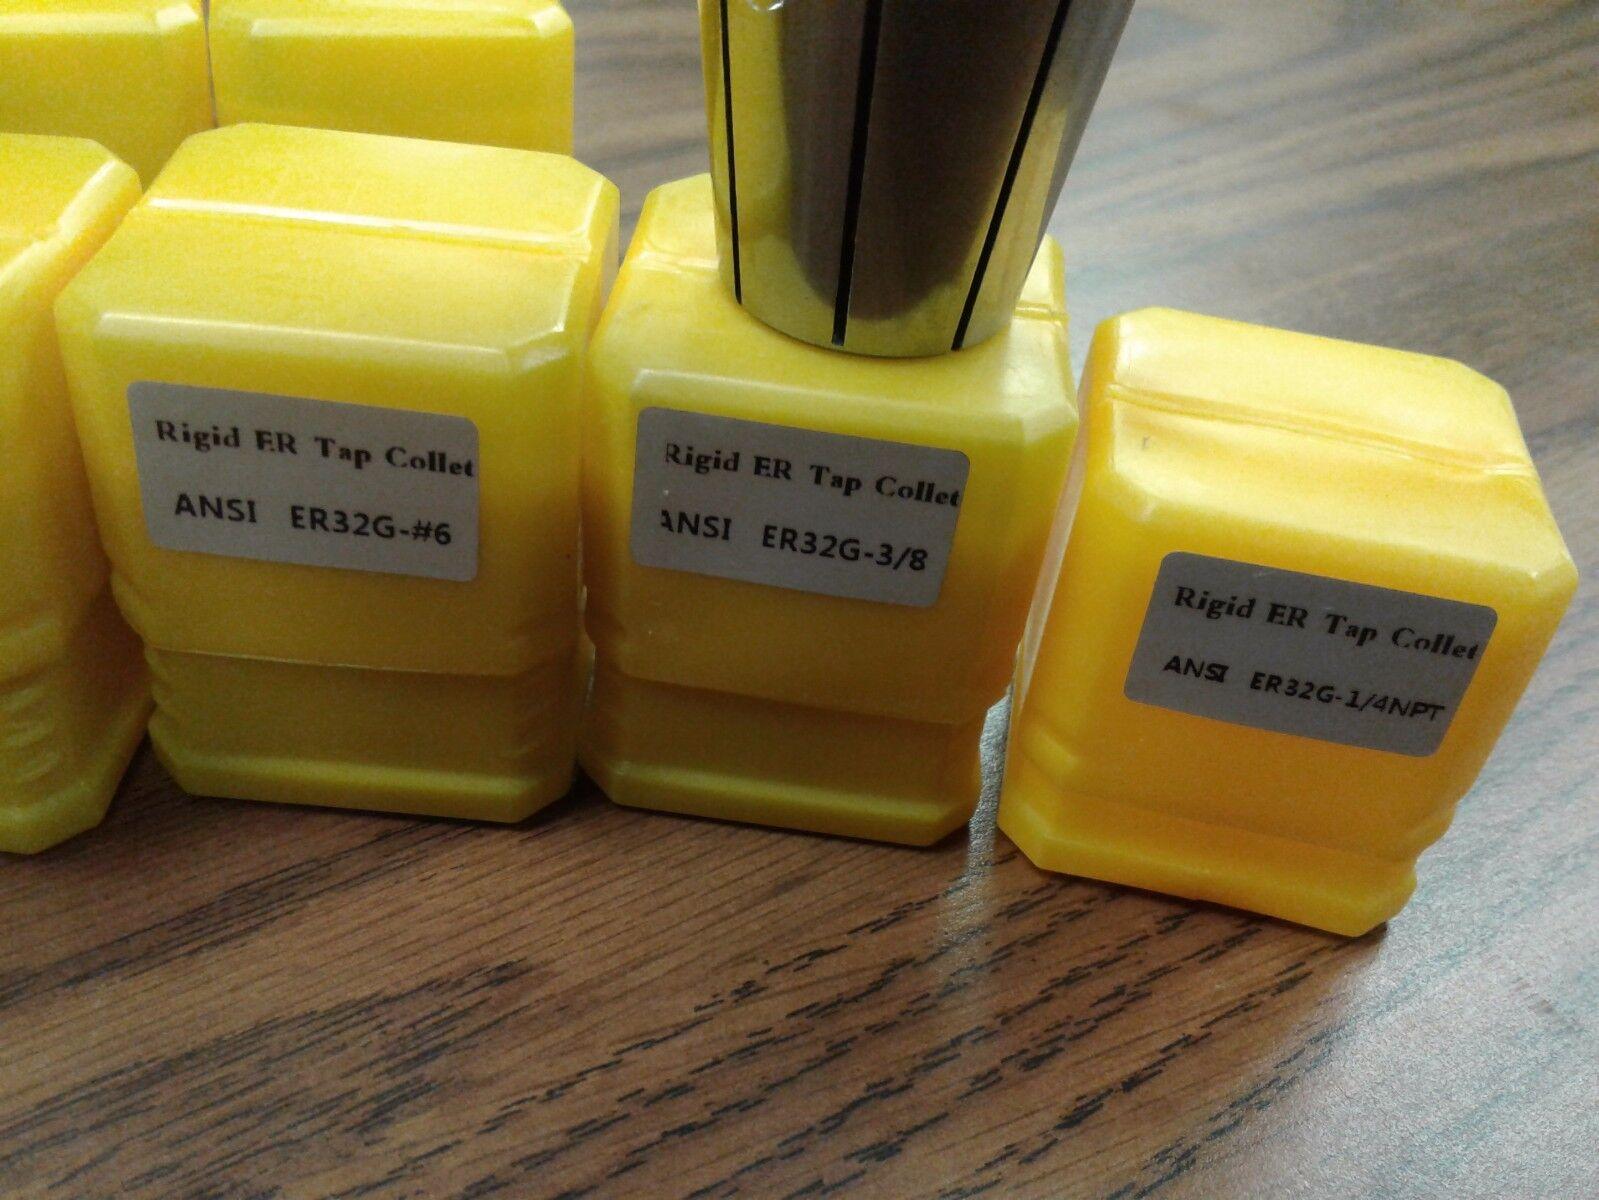 CAT40-ER32 flotante Tap/Tapping titular  W 11 Pulgadas  titular NPT grifos Collares CAT40-ER32-T 8b37ee